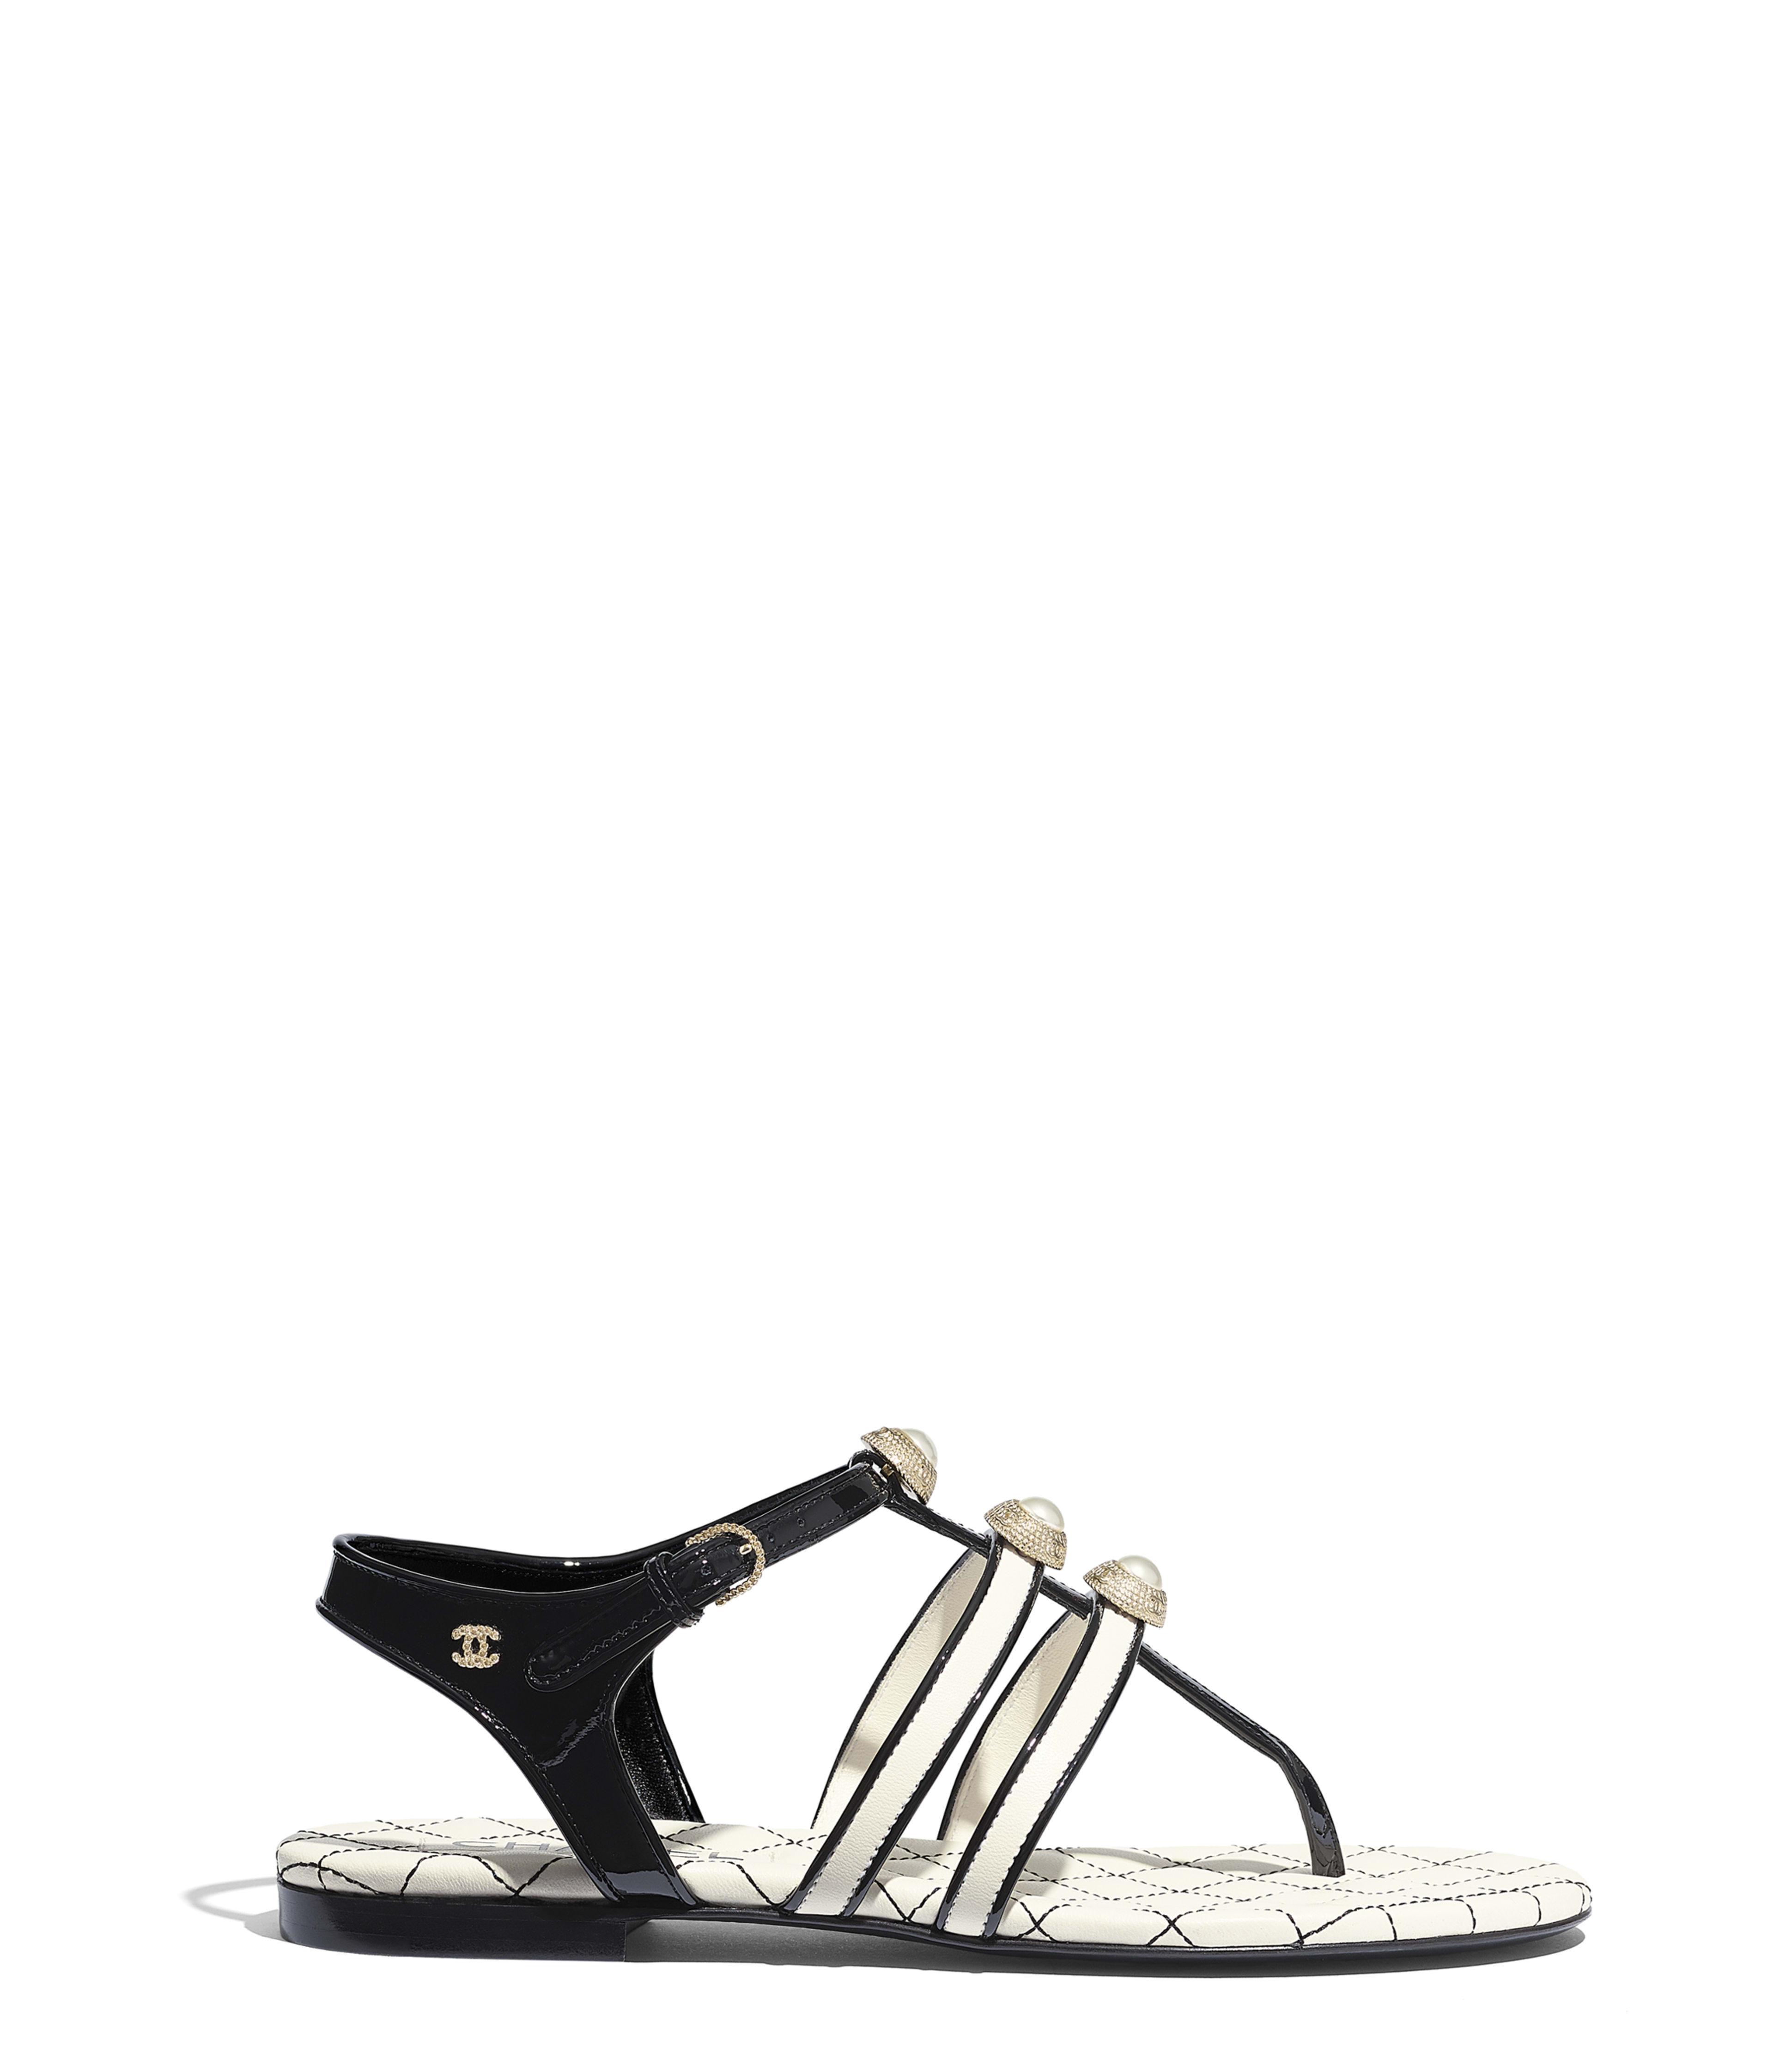 e6560bf8daa Sandals - Shoes | CHANEL